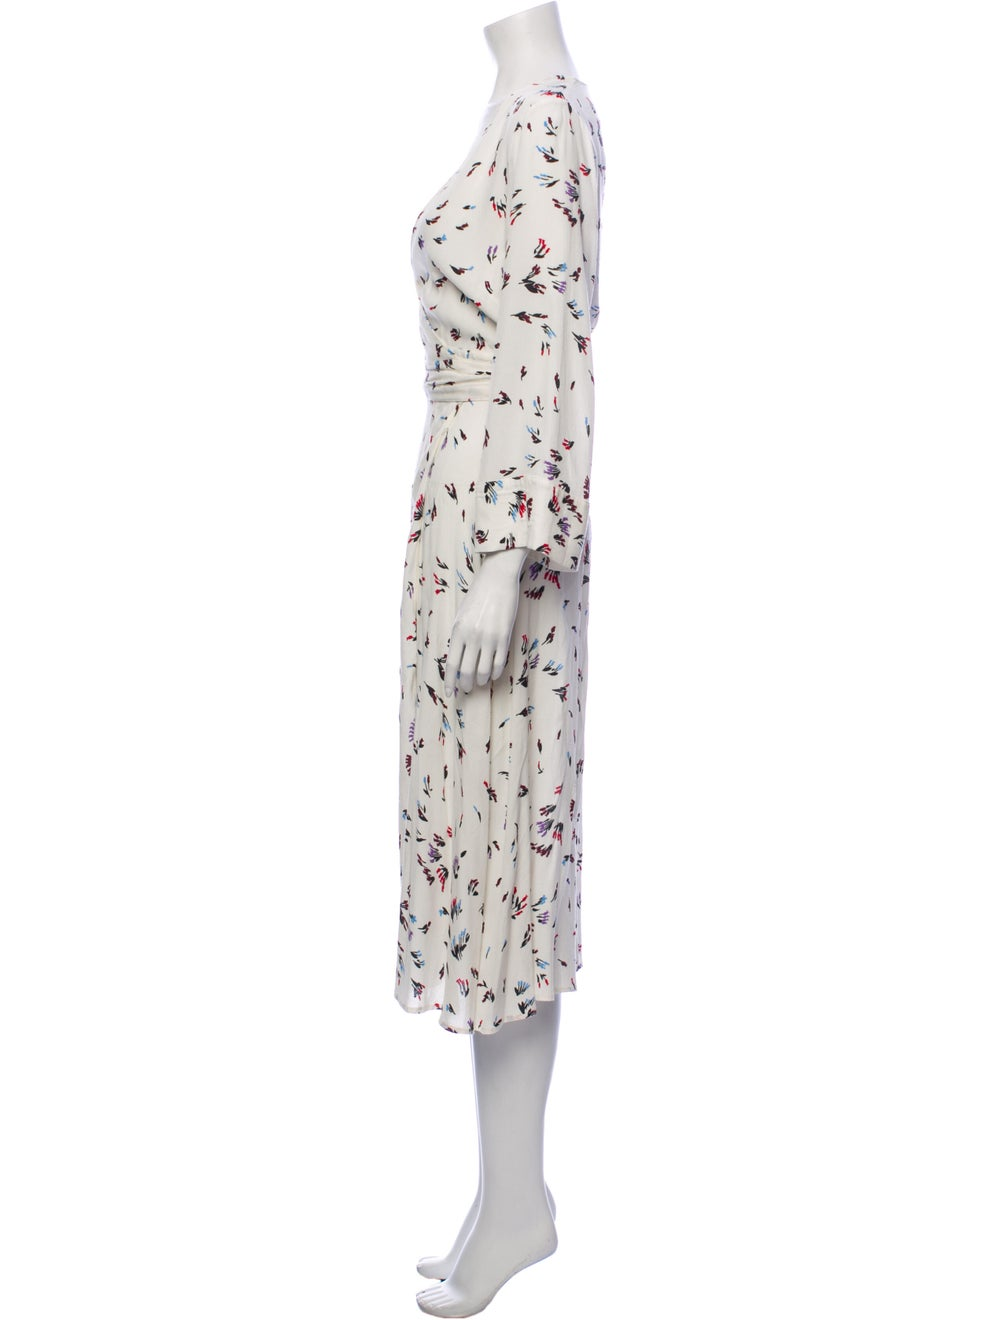 Ganni Printed Midi Length Dress White - image 2